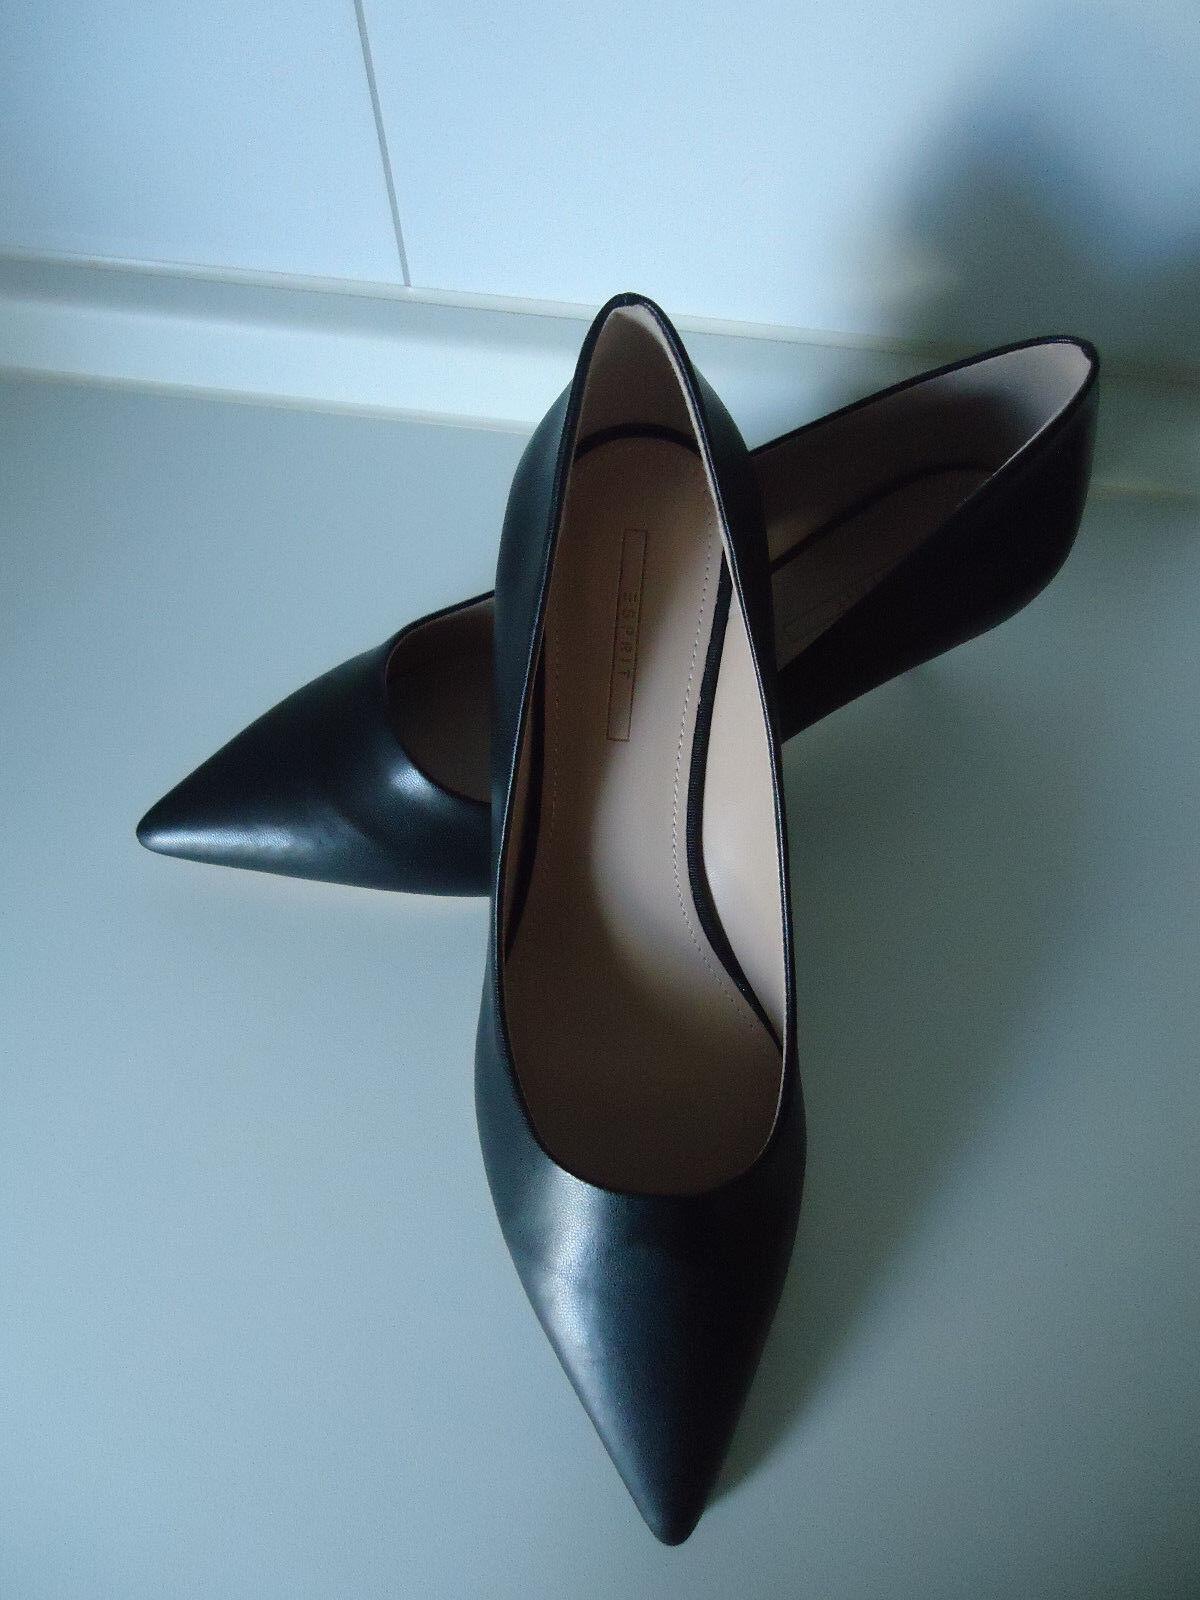 ESPRIT  Spitze Pumps in glatter Leder-Optik Farbe: schwarz Grösse 40